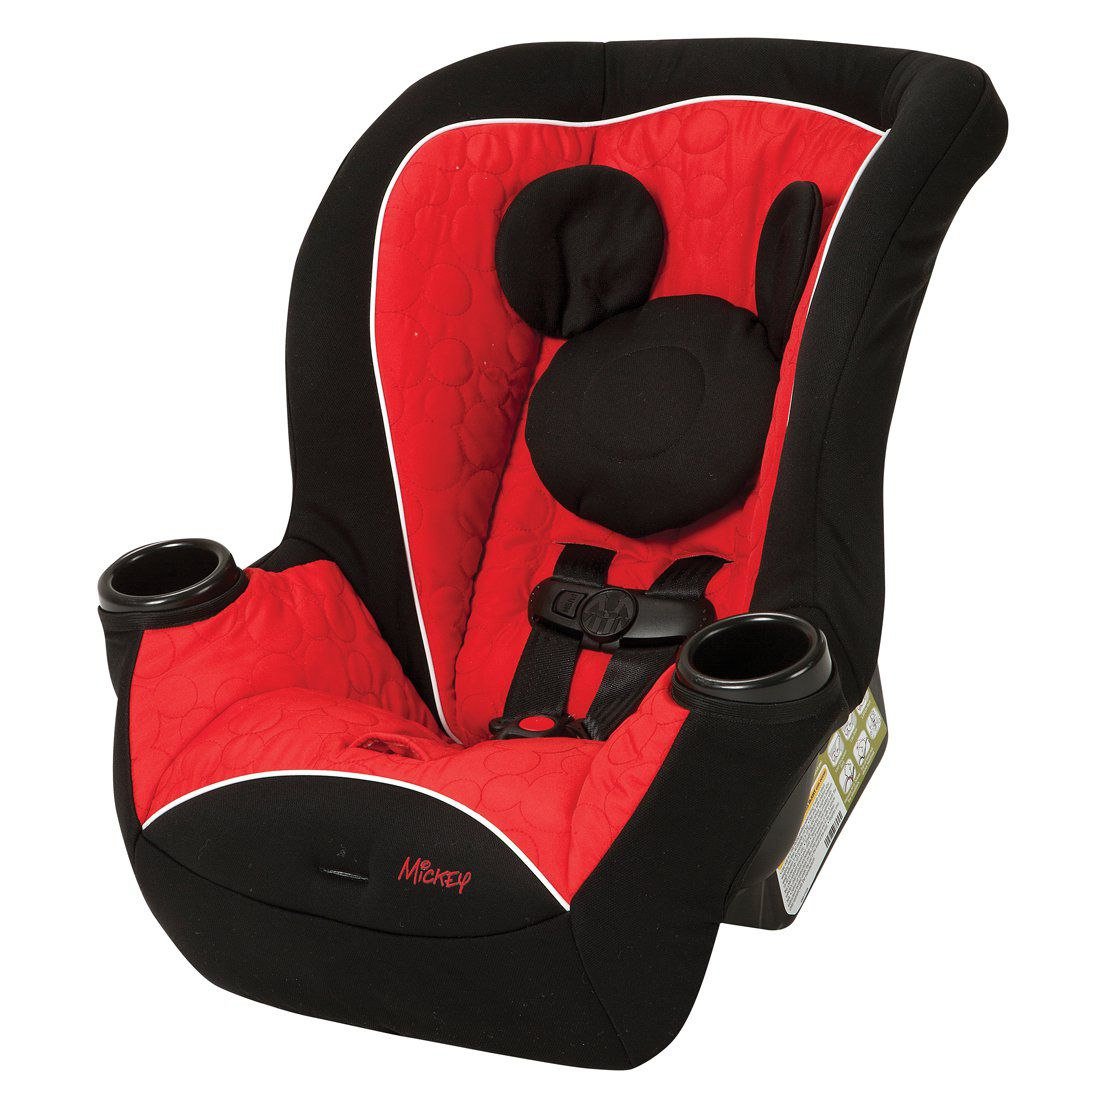 Cutest Car Seat Disney Apt Convertible Mouseketeer Mickey